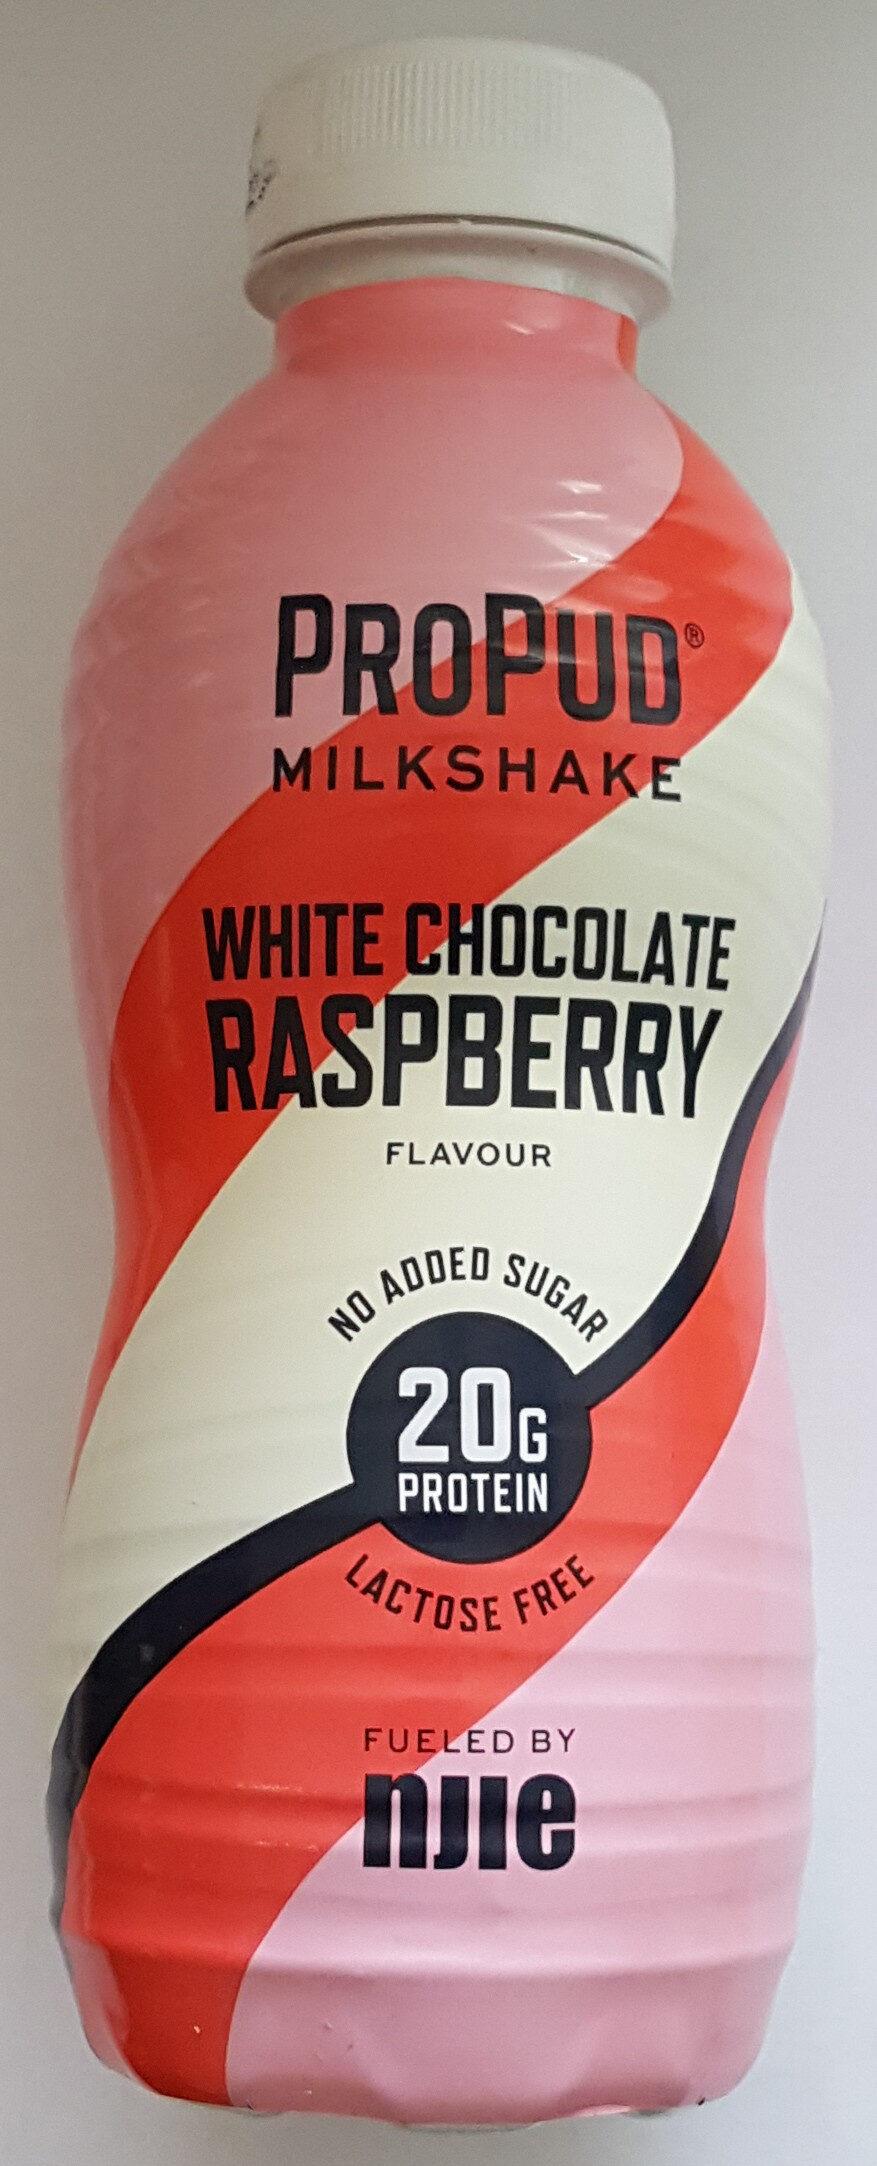 Njie ProPud Proteinmilkshake White Chocolate Raspberry Flavour - Product - sv